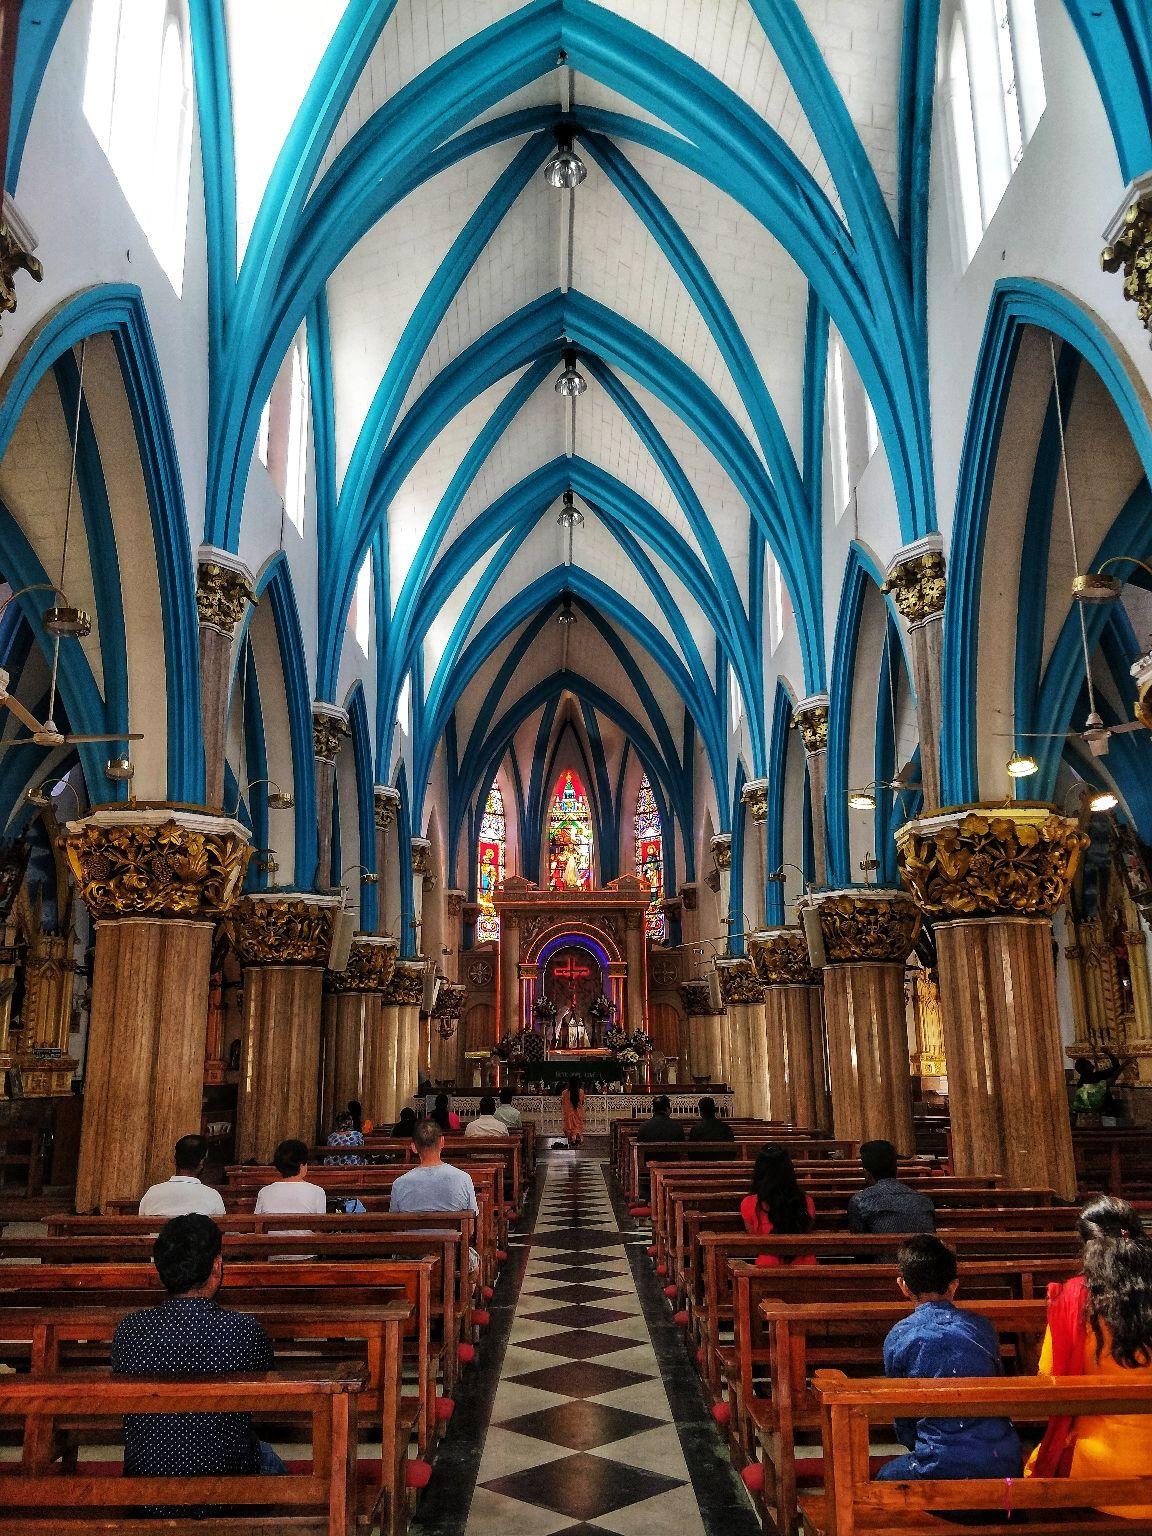 Photo of St. Mary's Basilica By Anusha Rao